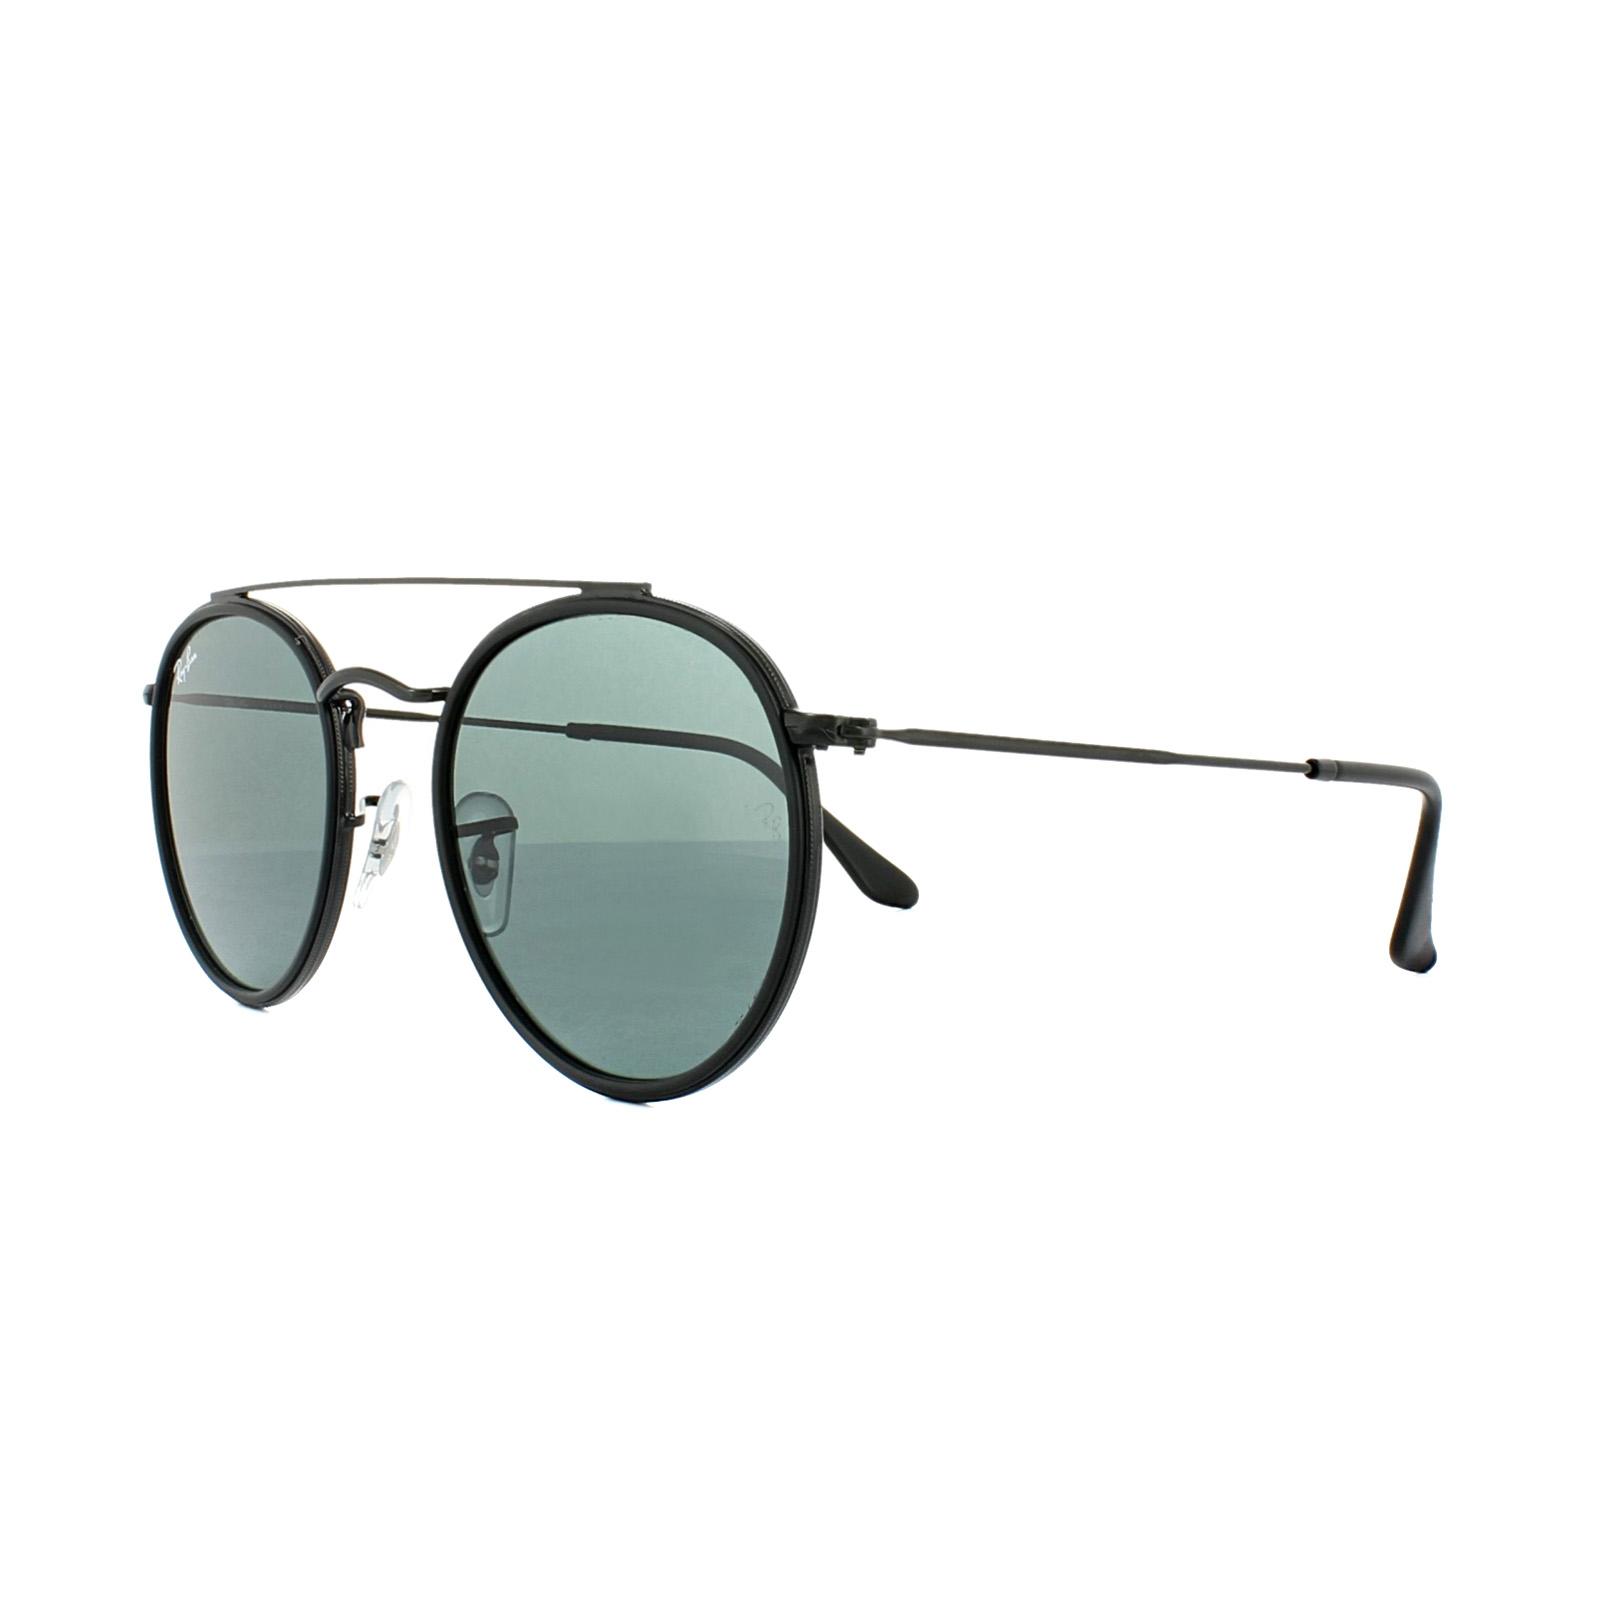 a6687eff5 Sentinel Ray-Ban Sunglasses Round Double Bridge 3647N 002/R5 Black Blue Grey